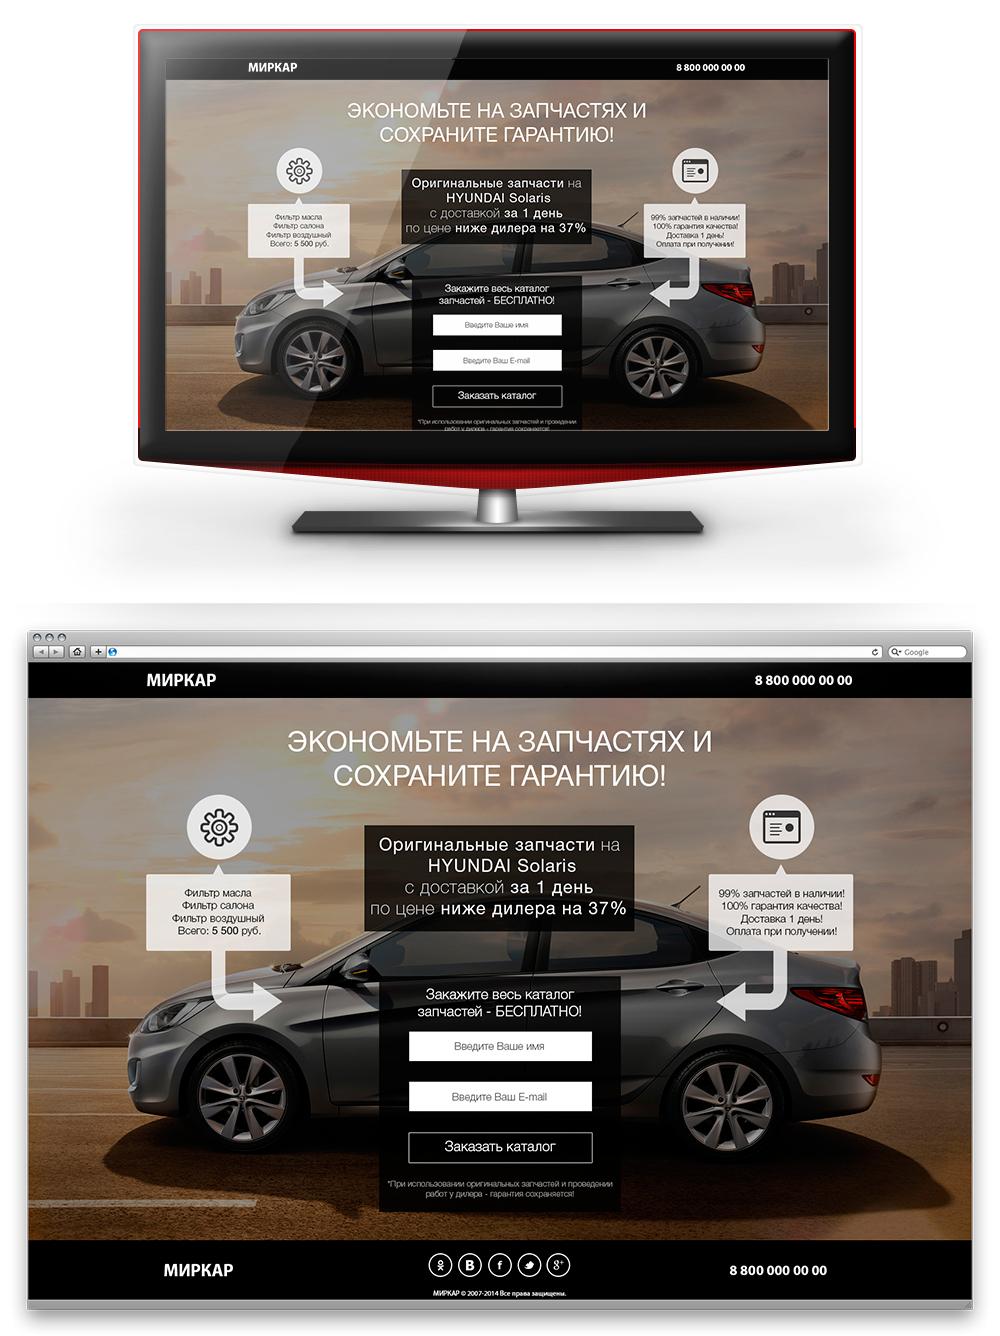 Дизайн сайта МИРКАР